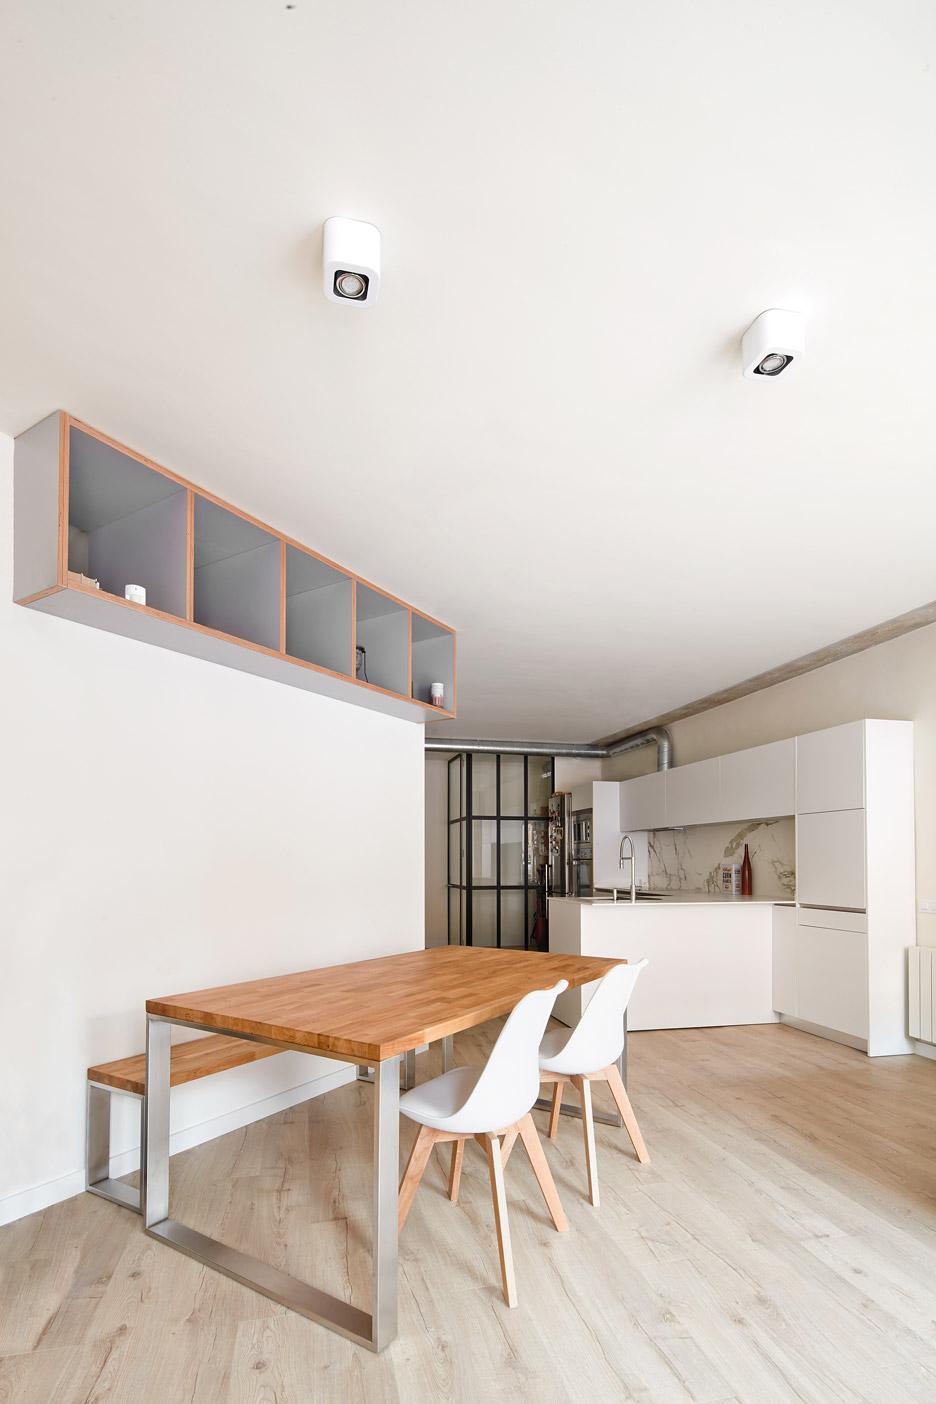 architecture_ open_layout__design_studia_interiors_osnovadesign_osnova_poltava_04